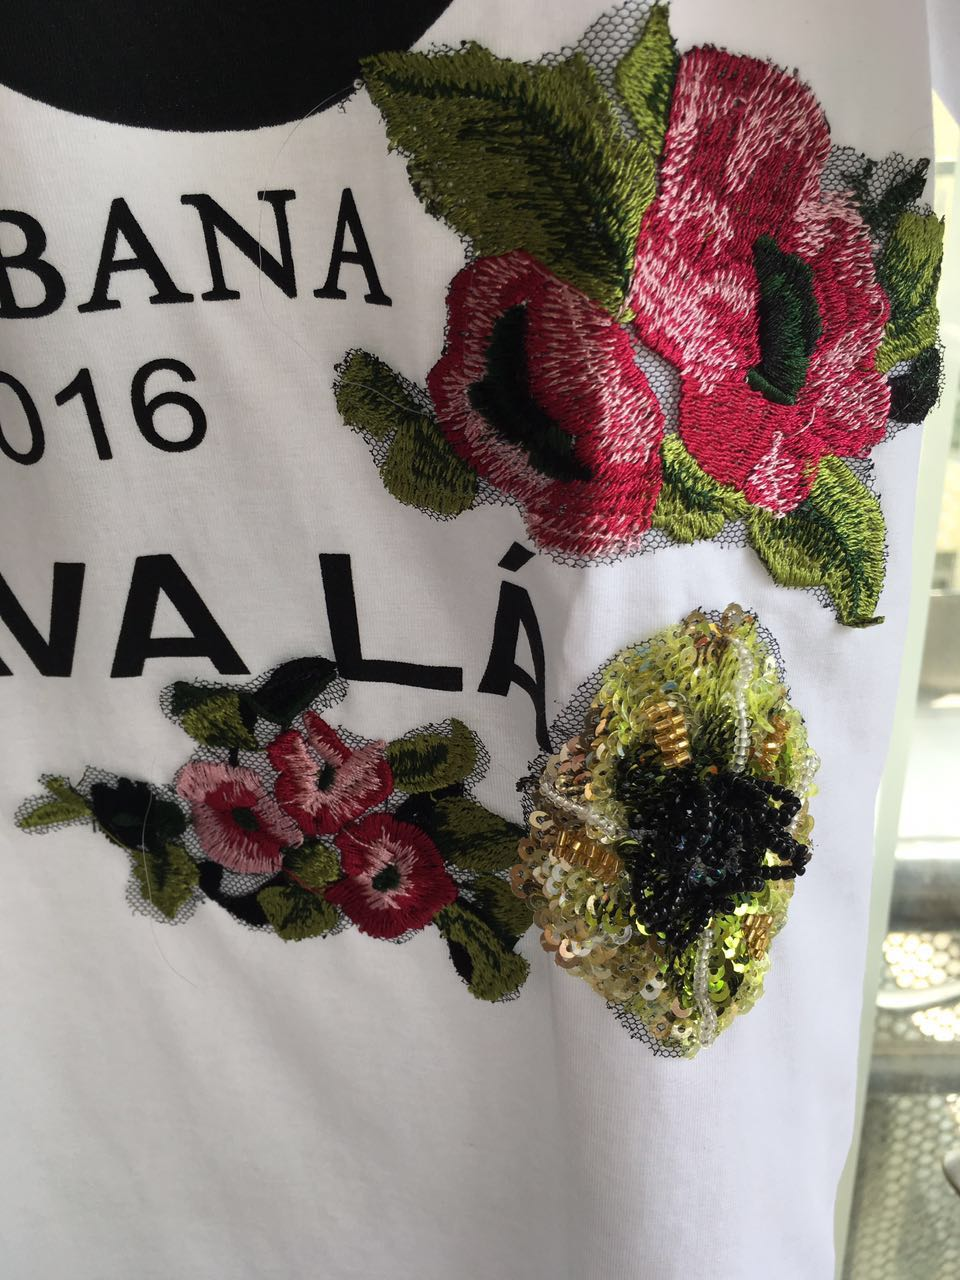 Free t-shirt design - 3401 High Quality 2017 Luxury Brand Fashion Women Spring Summer T Shirt Luxury Brand European